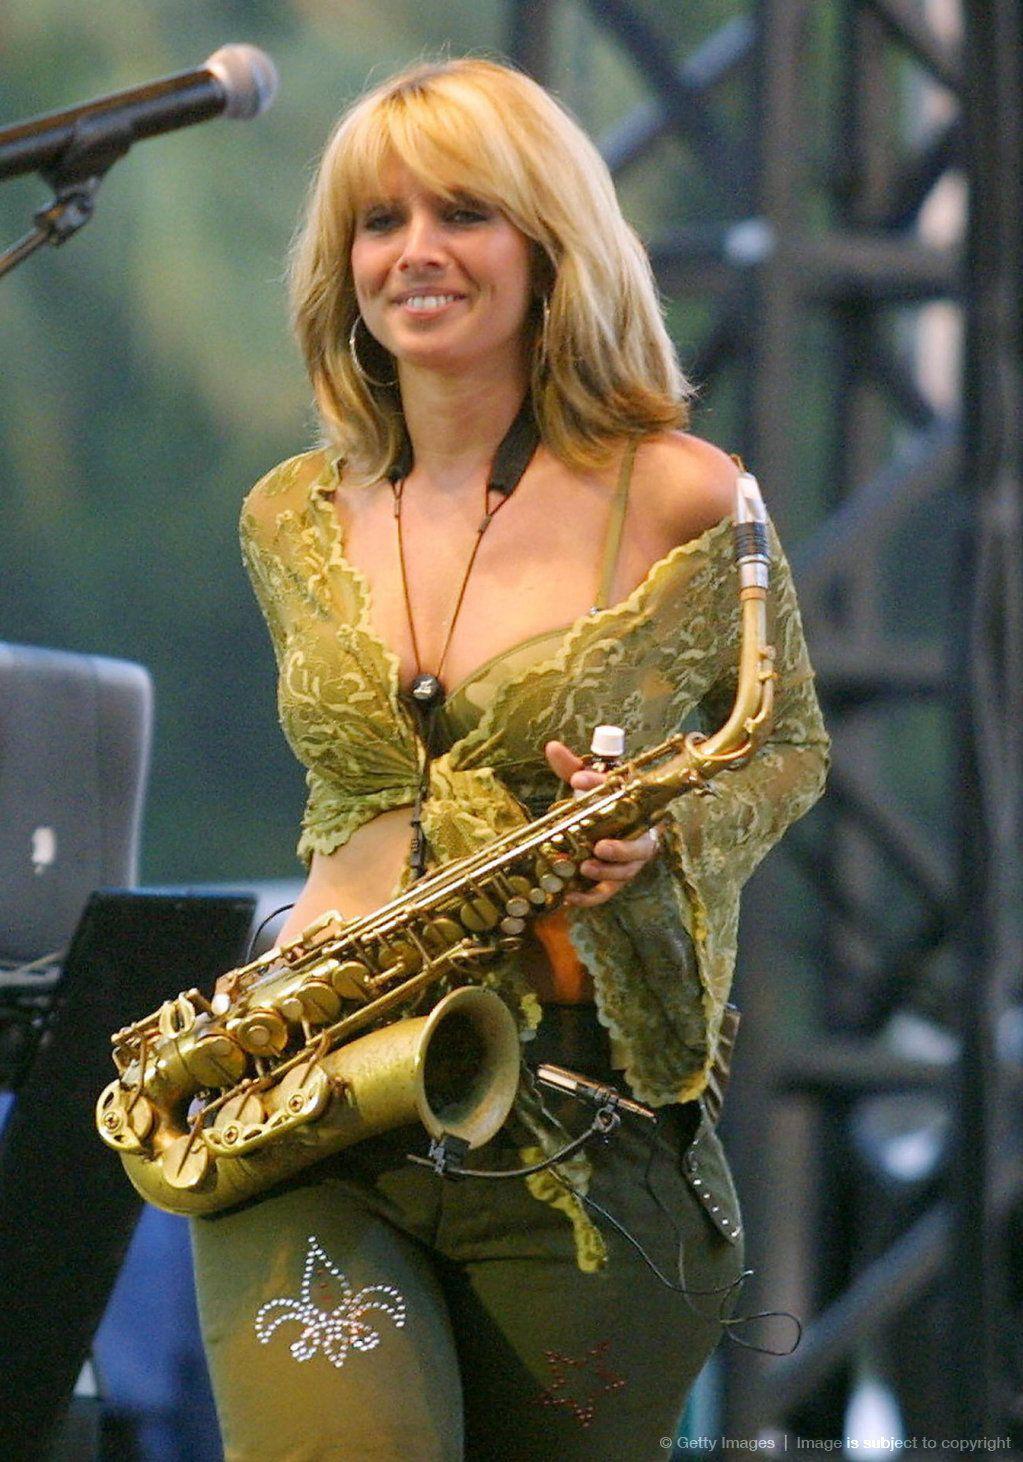 Candy dulfer female musicians jazz music jazz musicians